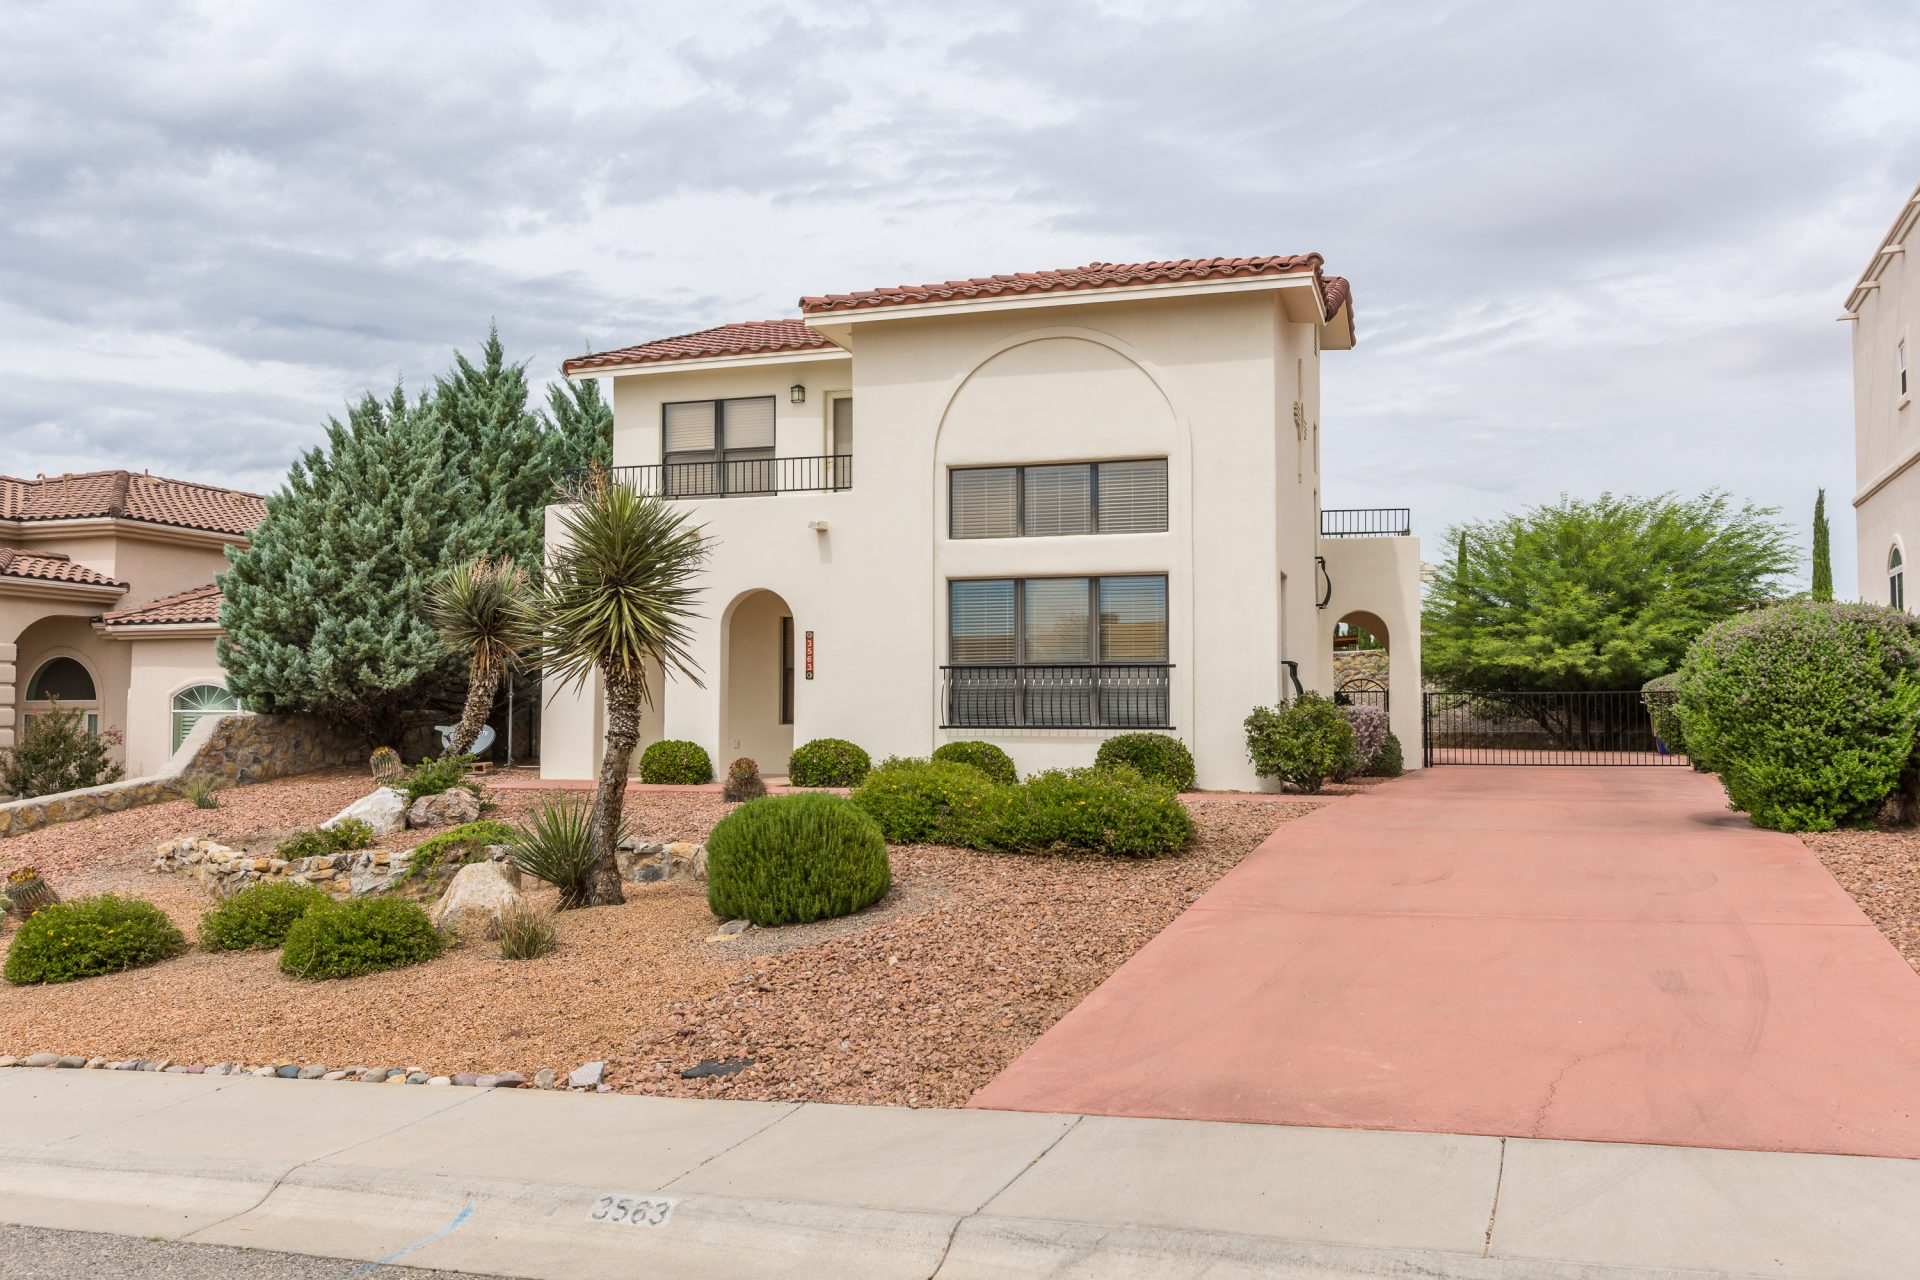 3563 Cactus Gulch Way, Las Cruces NM